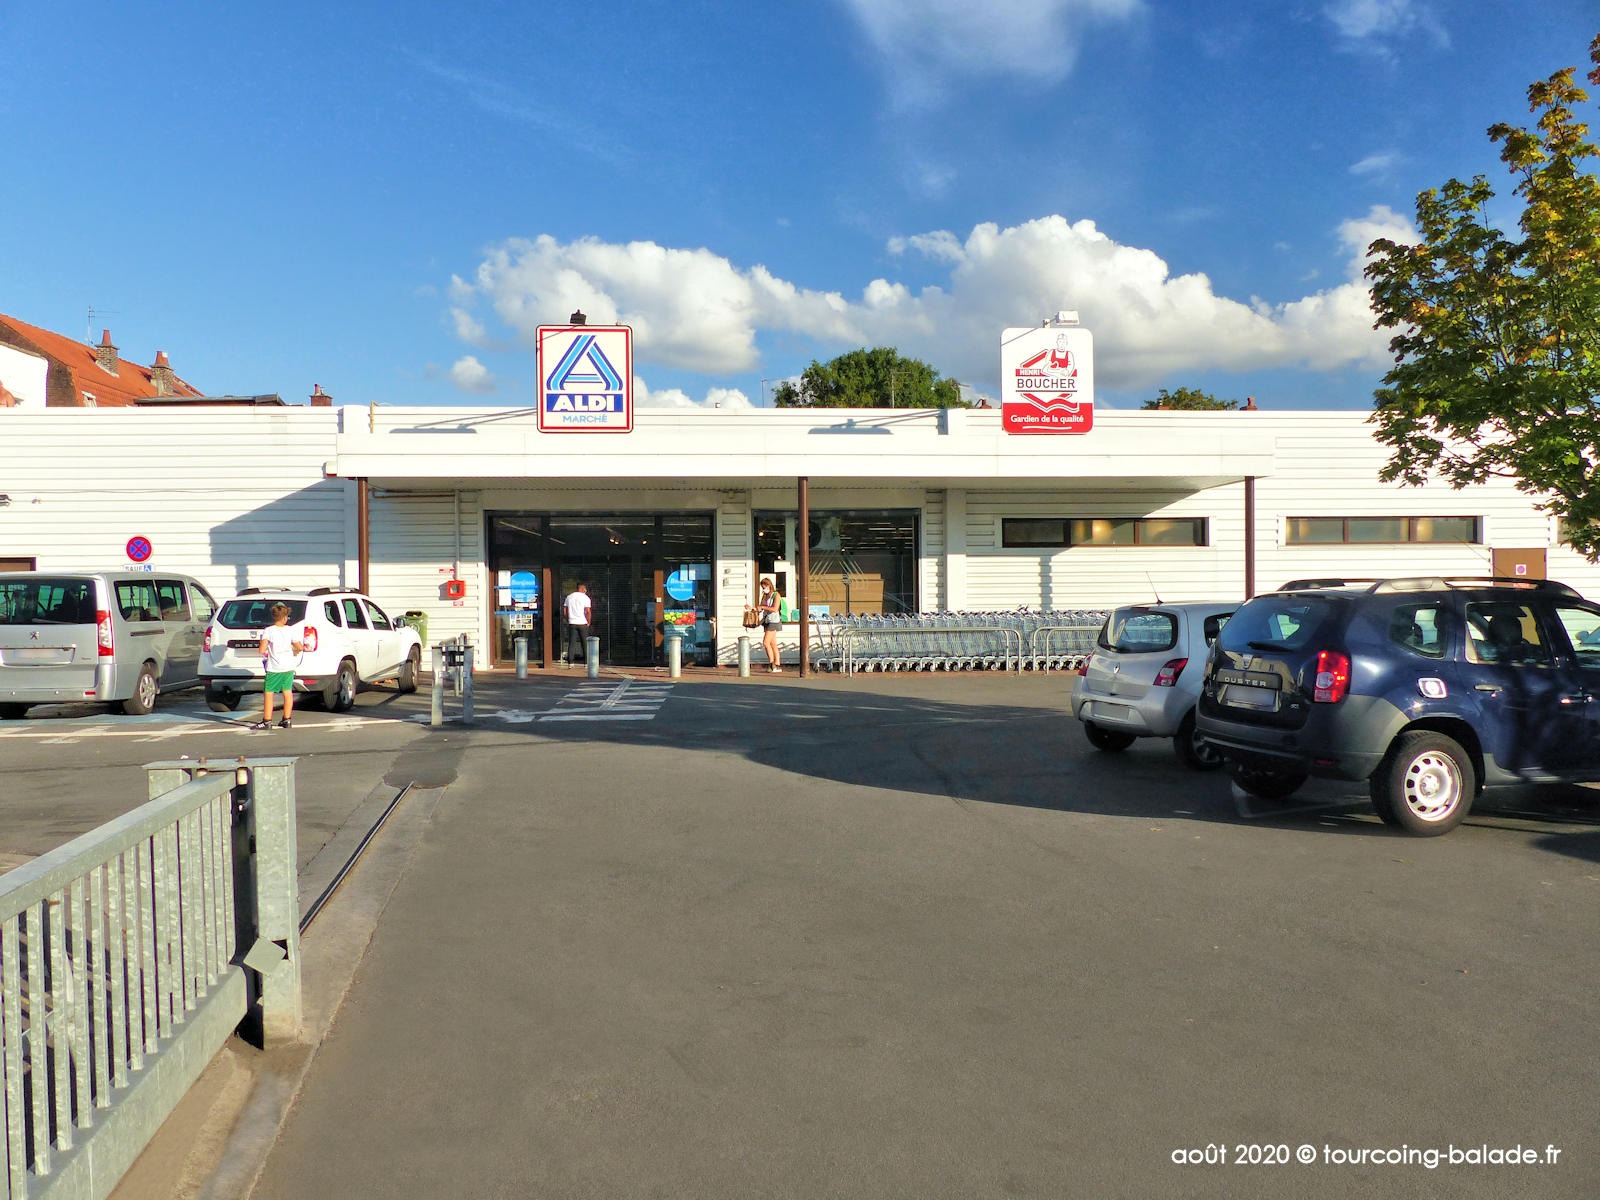 ADLI Brun Pain, Tourcoing 2020